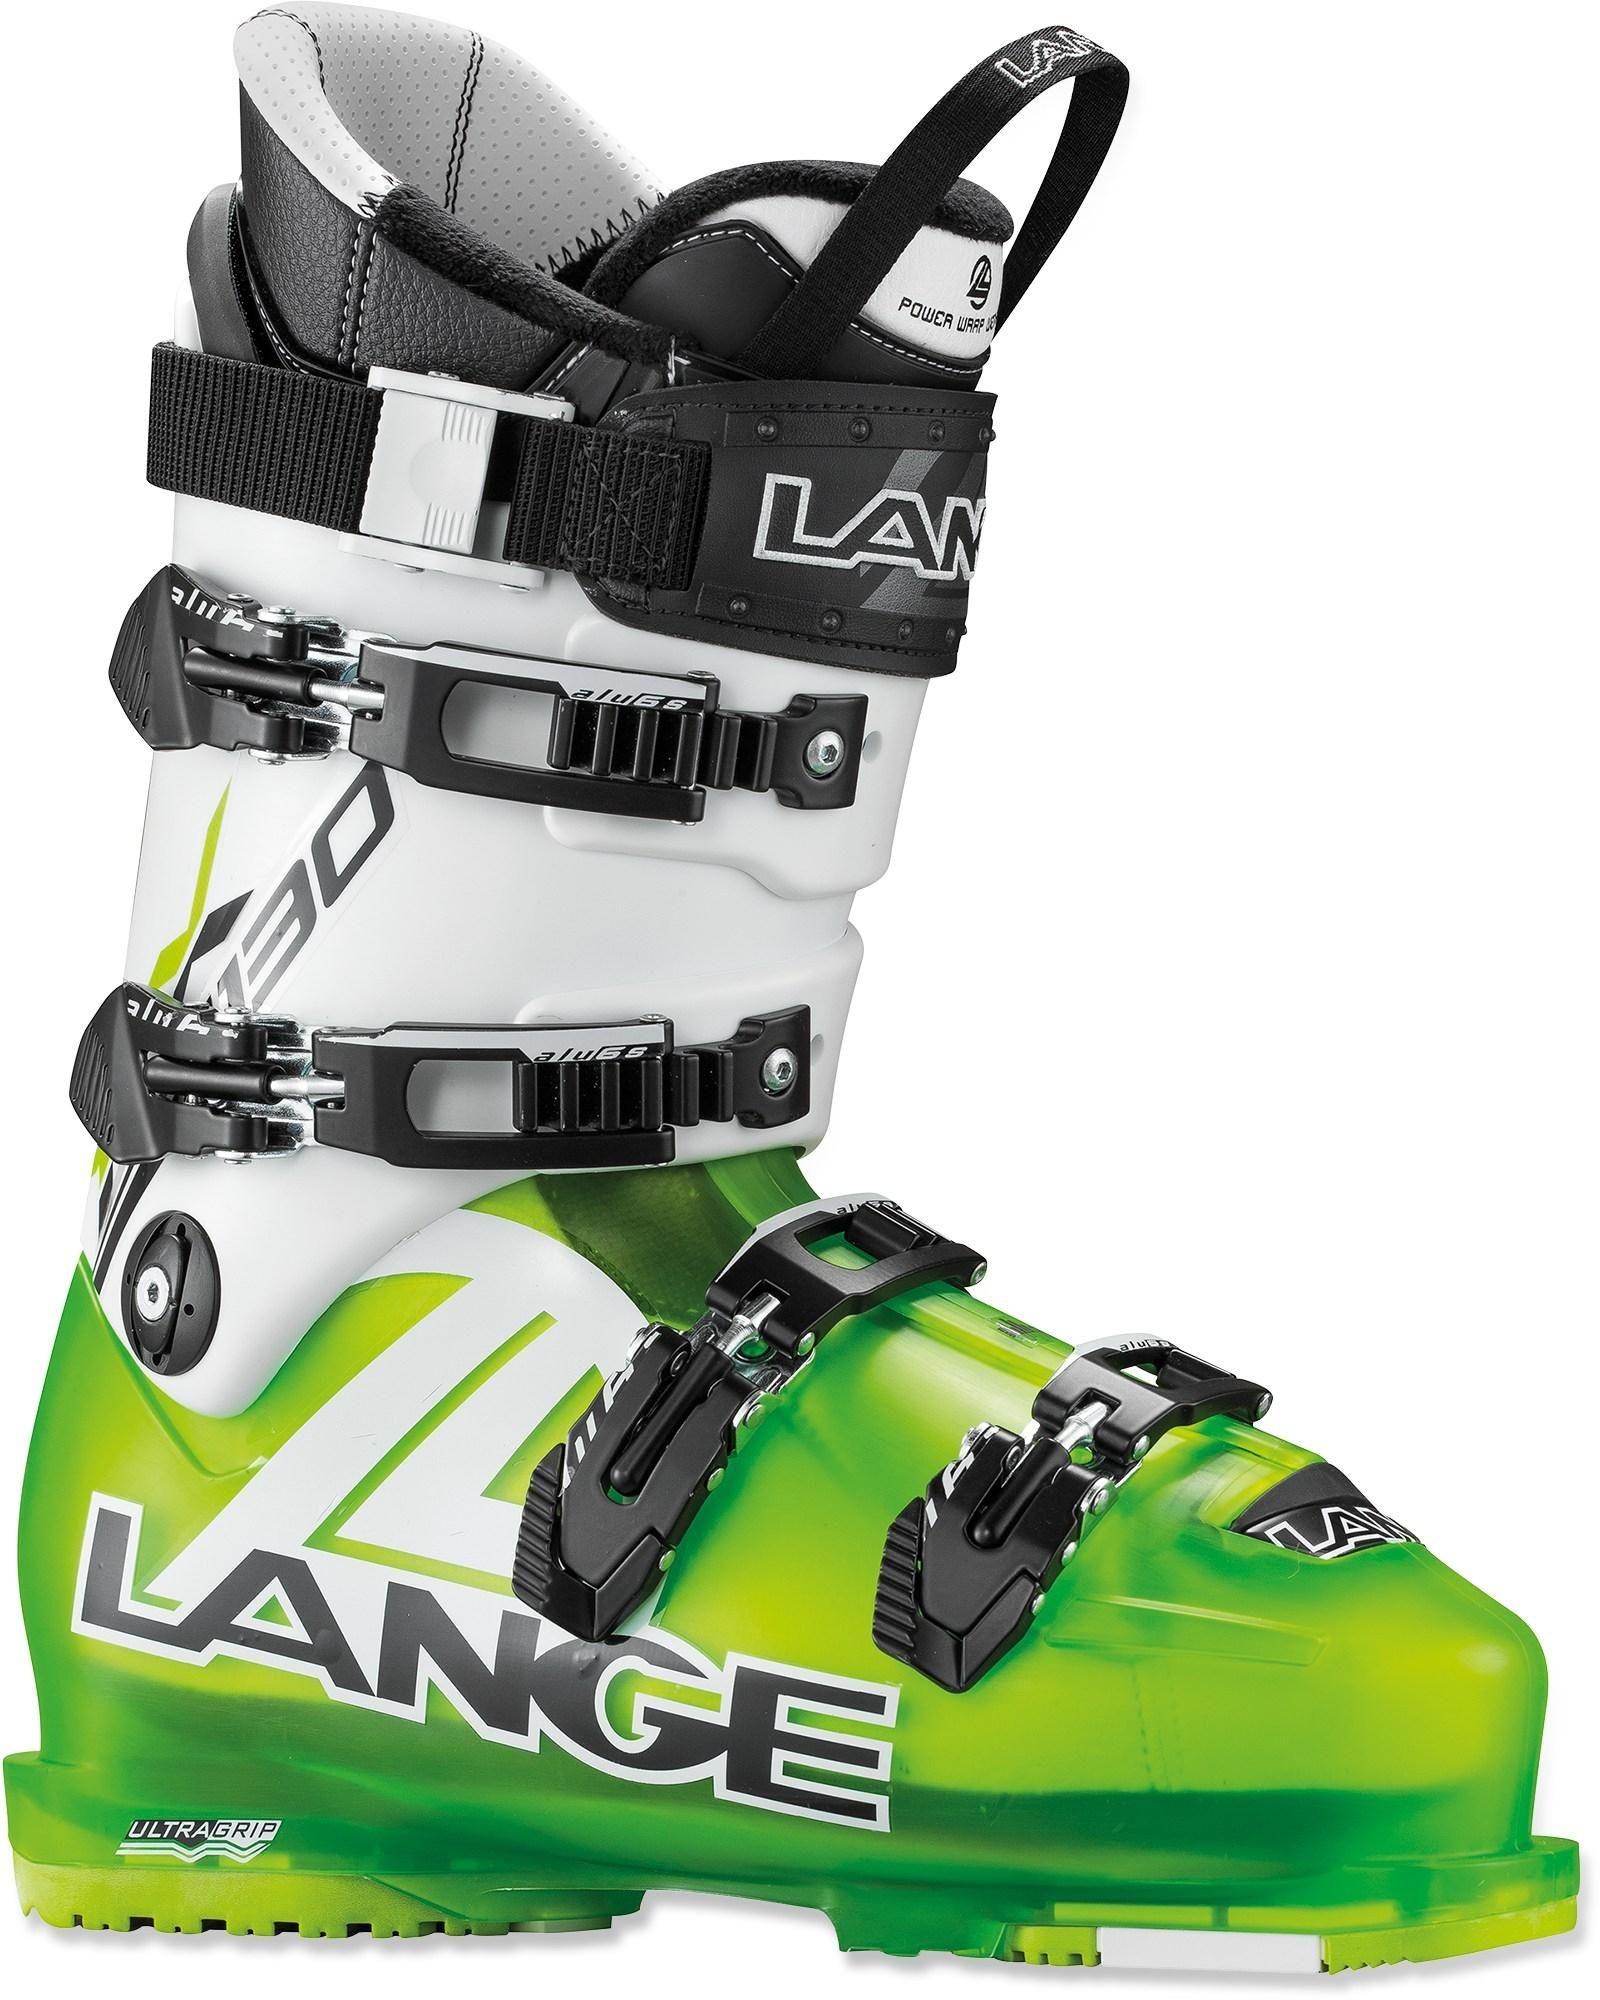 Lange Rx 130 Lv Ski Boots Men S 2013 2014 Rei Co Op Ski Boots 2015 Boots Ski Accessories